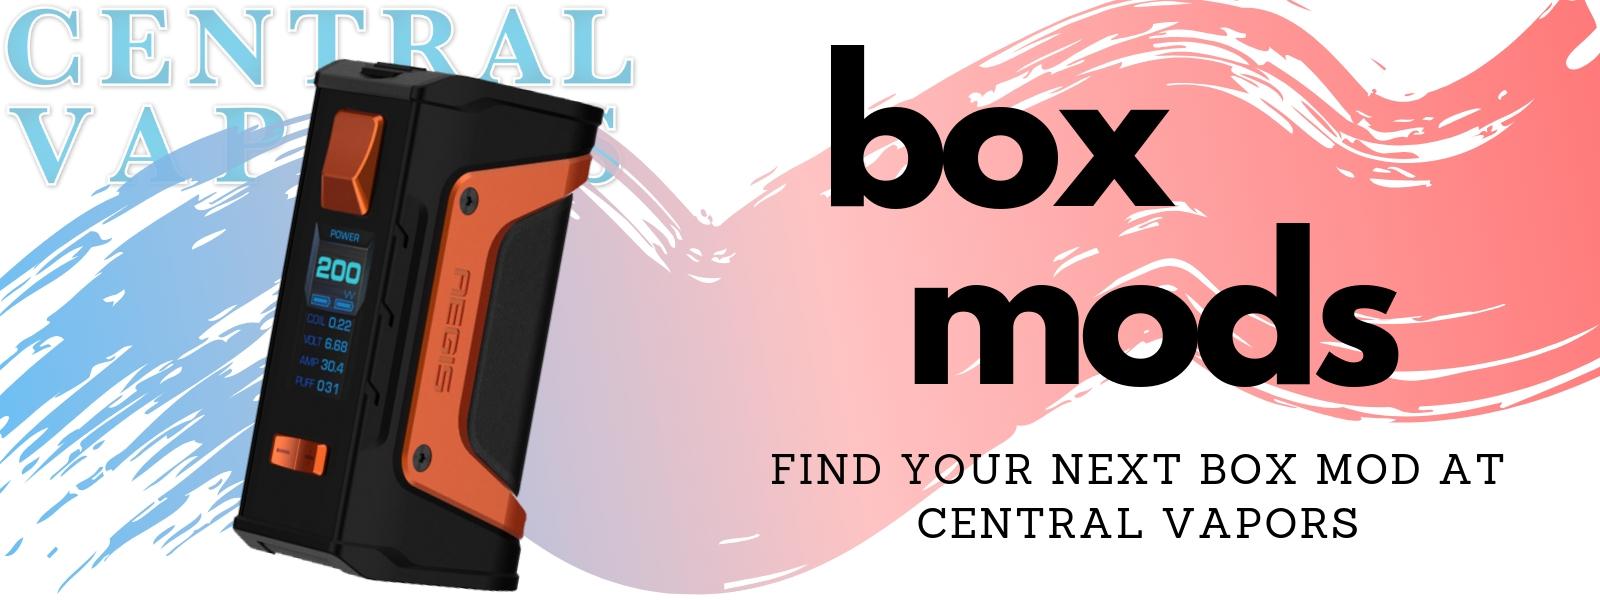 Central Vapors Box Mods